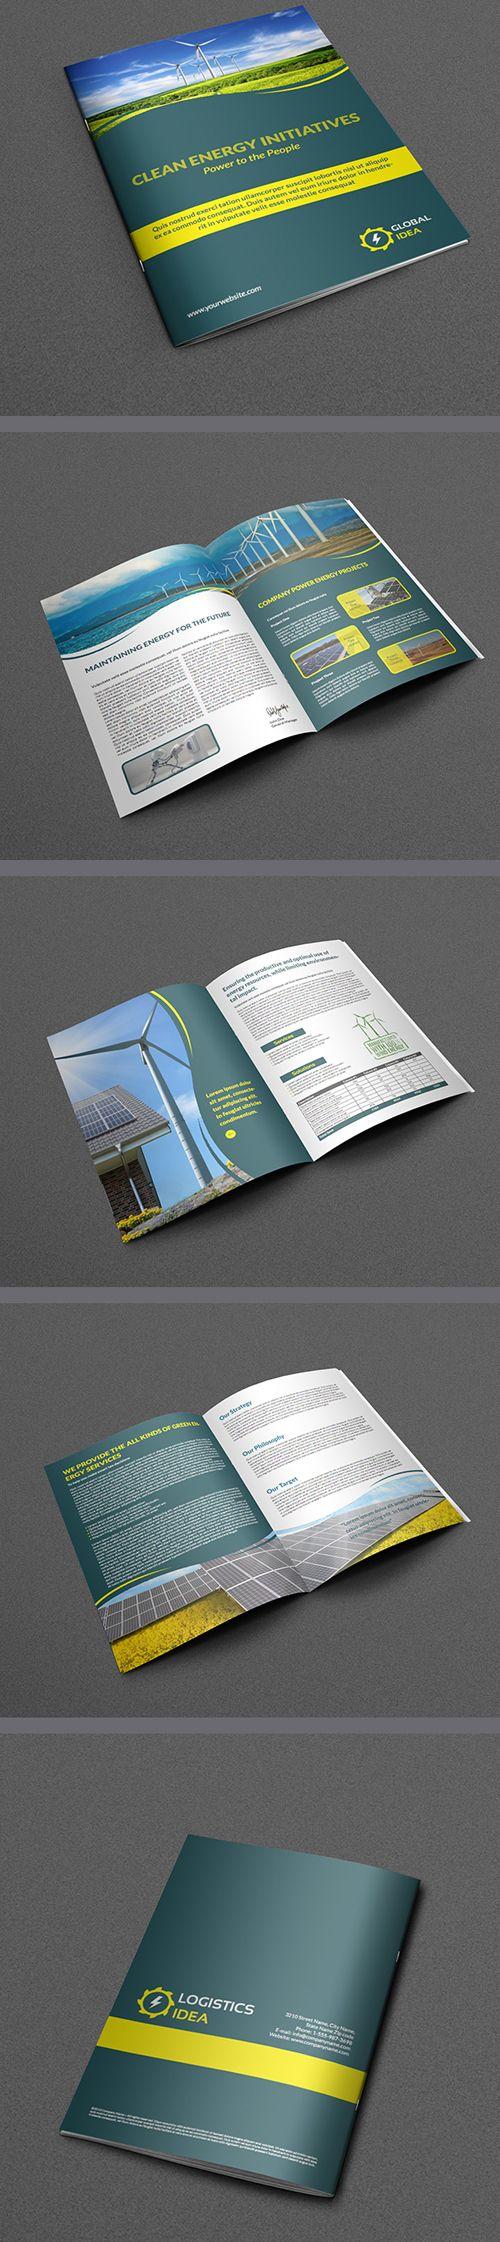 Power Energy Services Brochure Template  #brochuredesign #corporatebrochure #graphicdesign